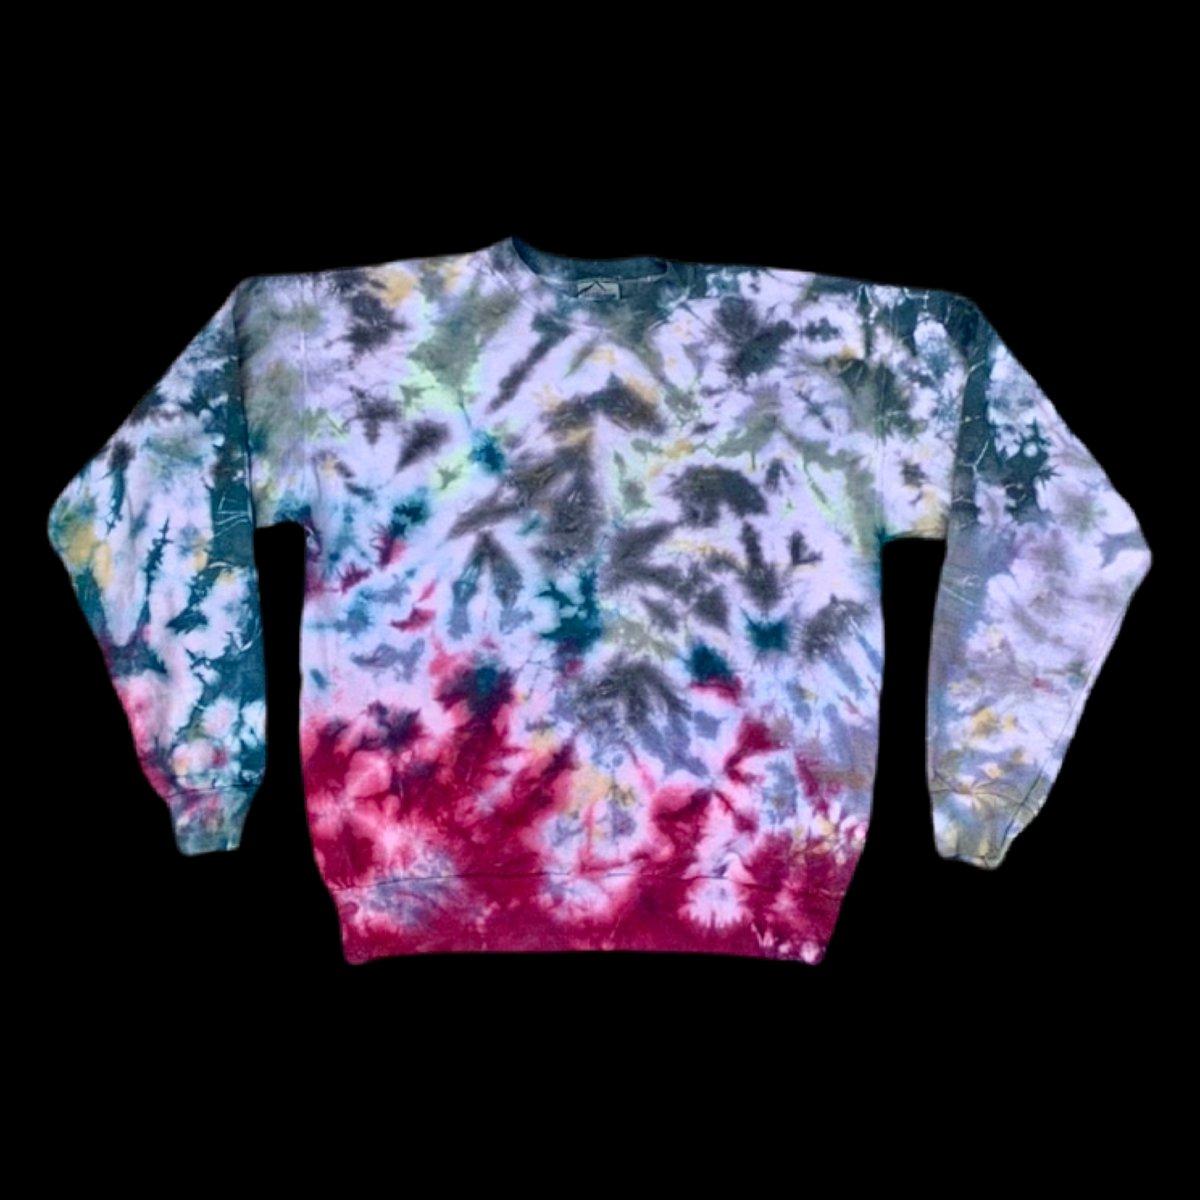 Vintage 90's Tie Dyed Crewneck Sweatshirt! - Medium